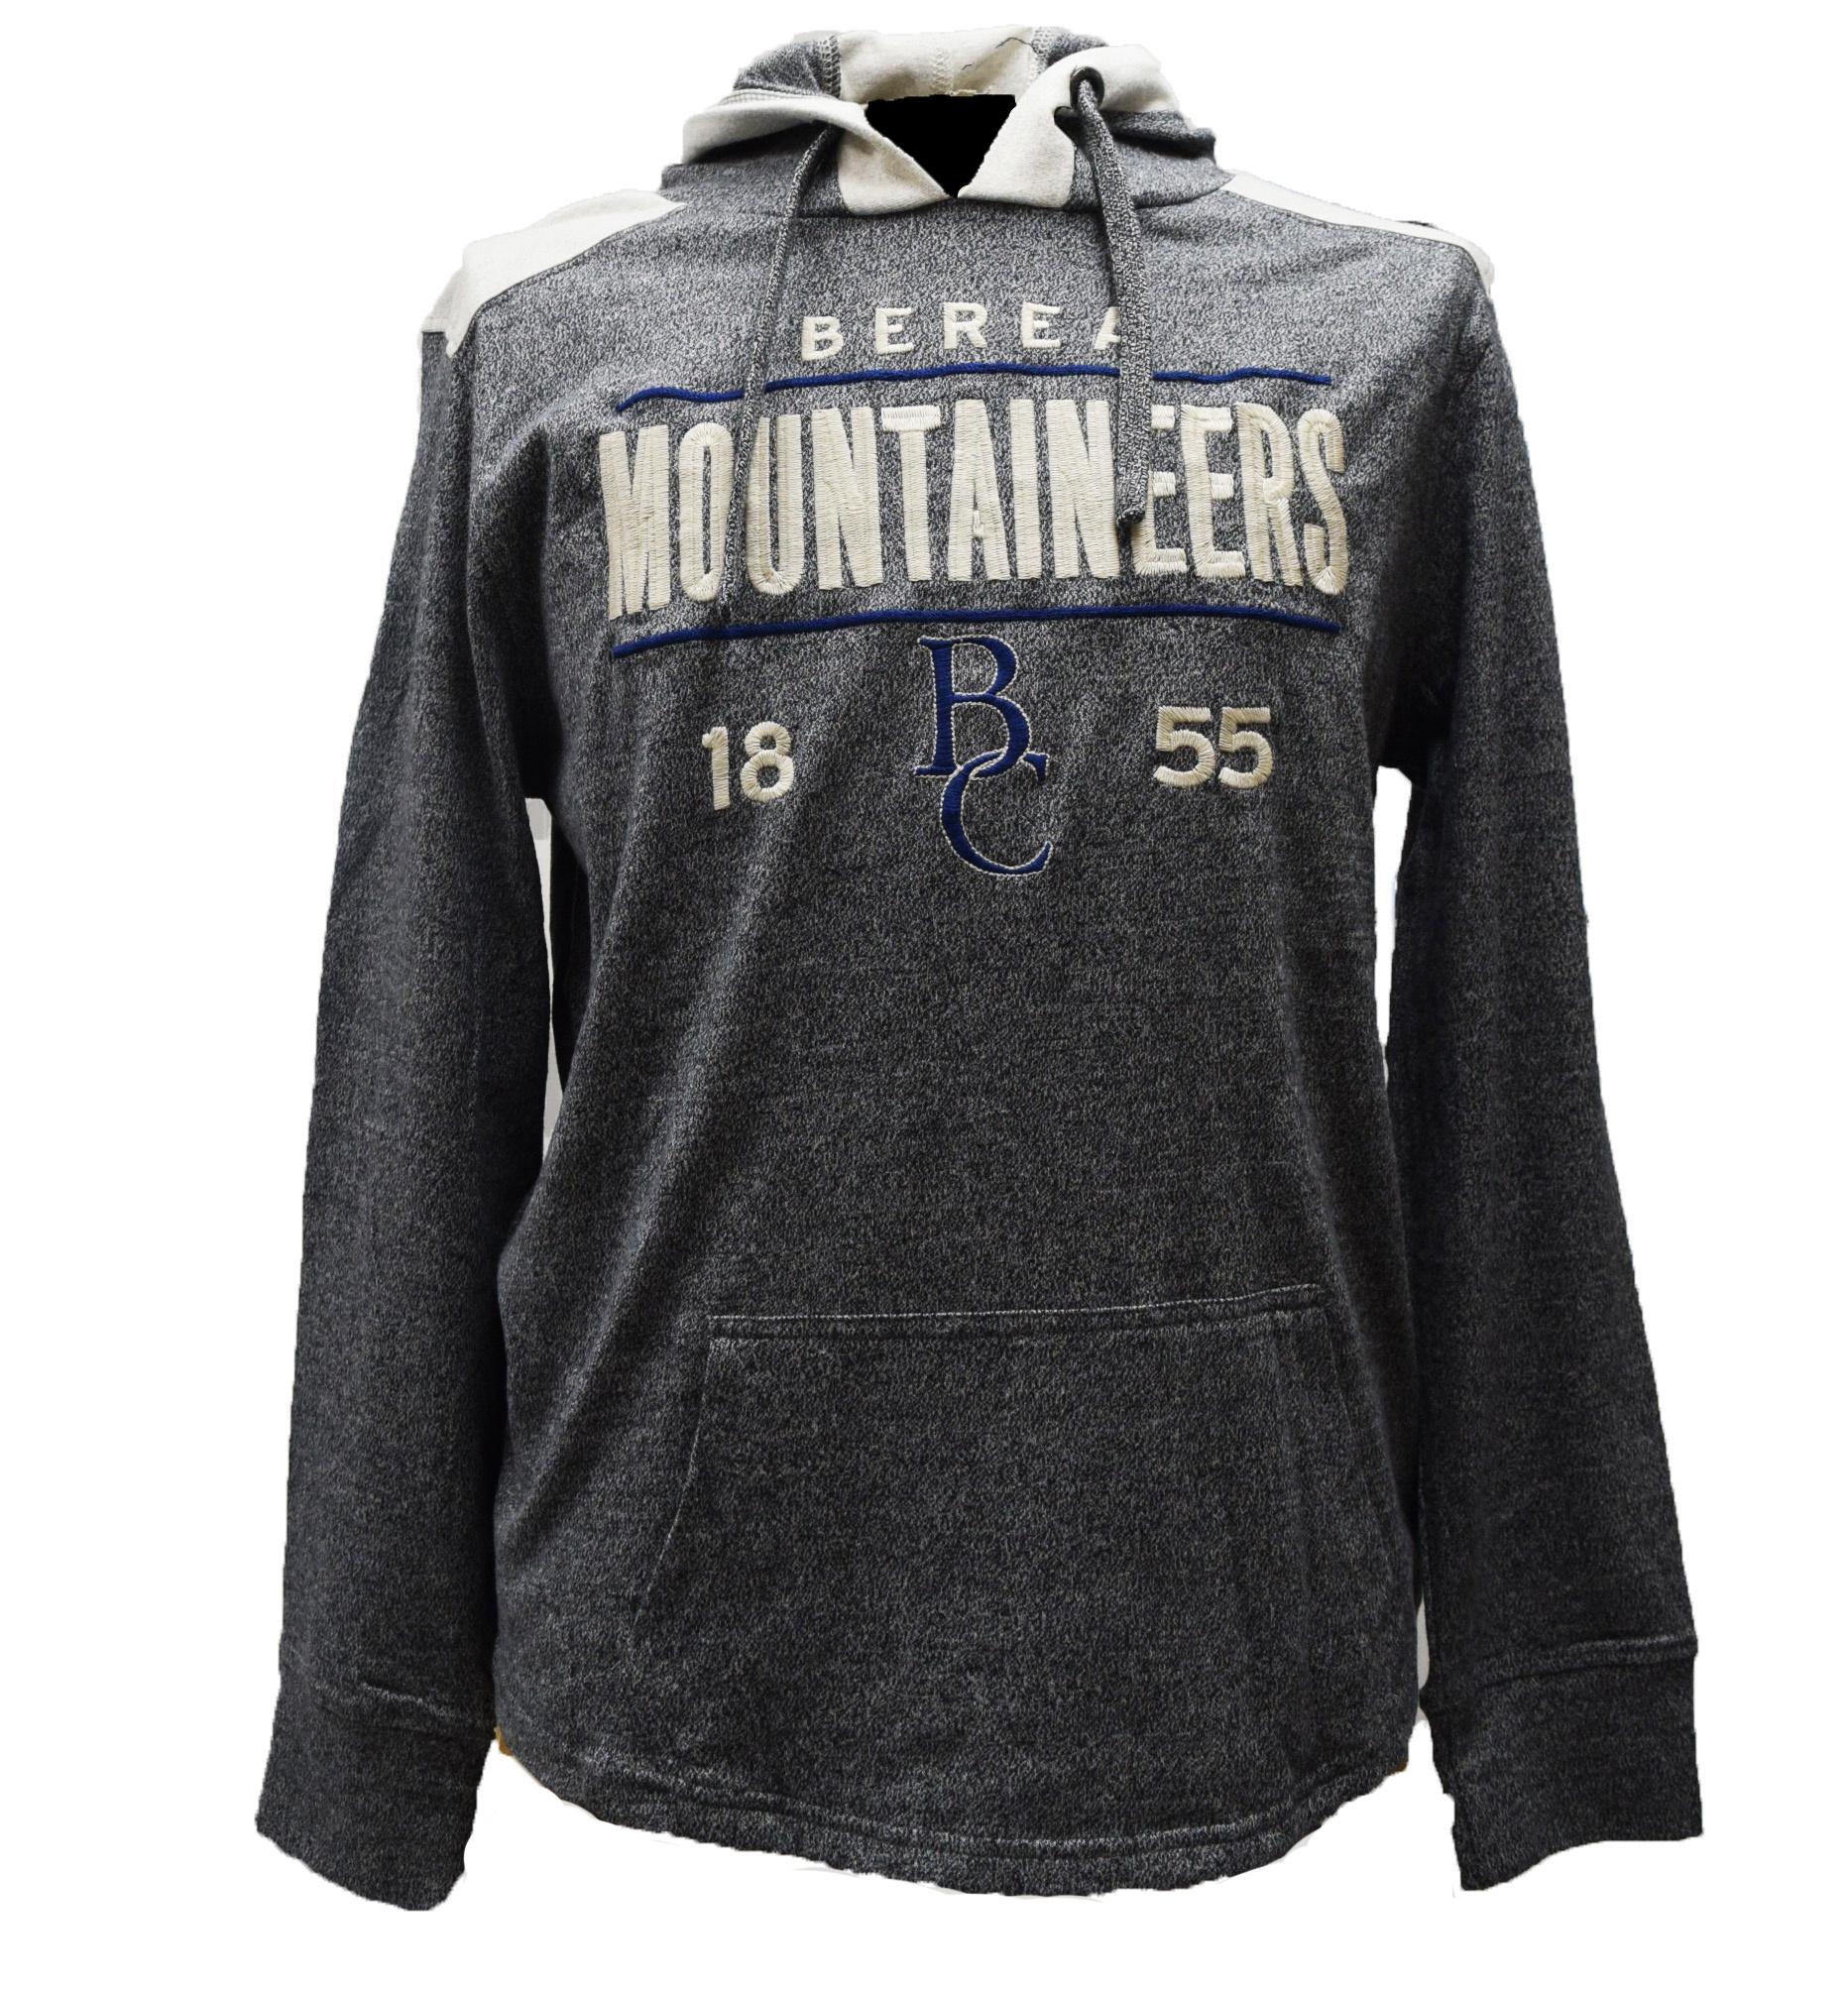 Gray Berea Mountaineers T-Shirt Hoodie-1